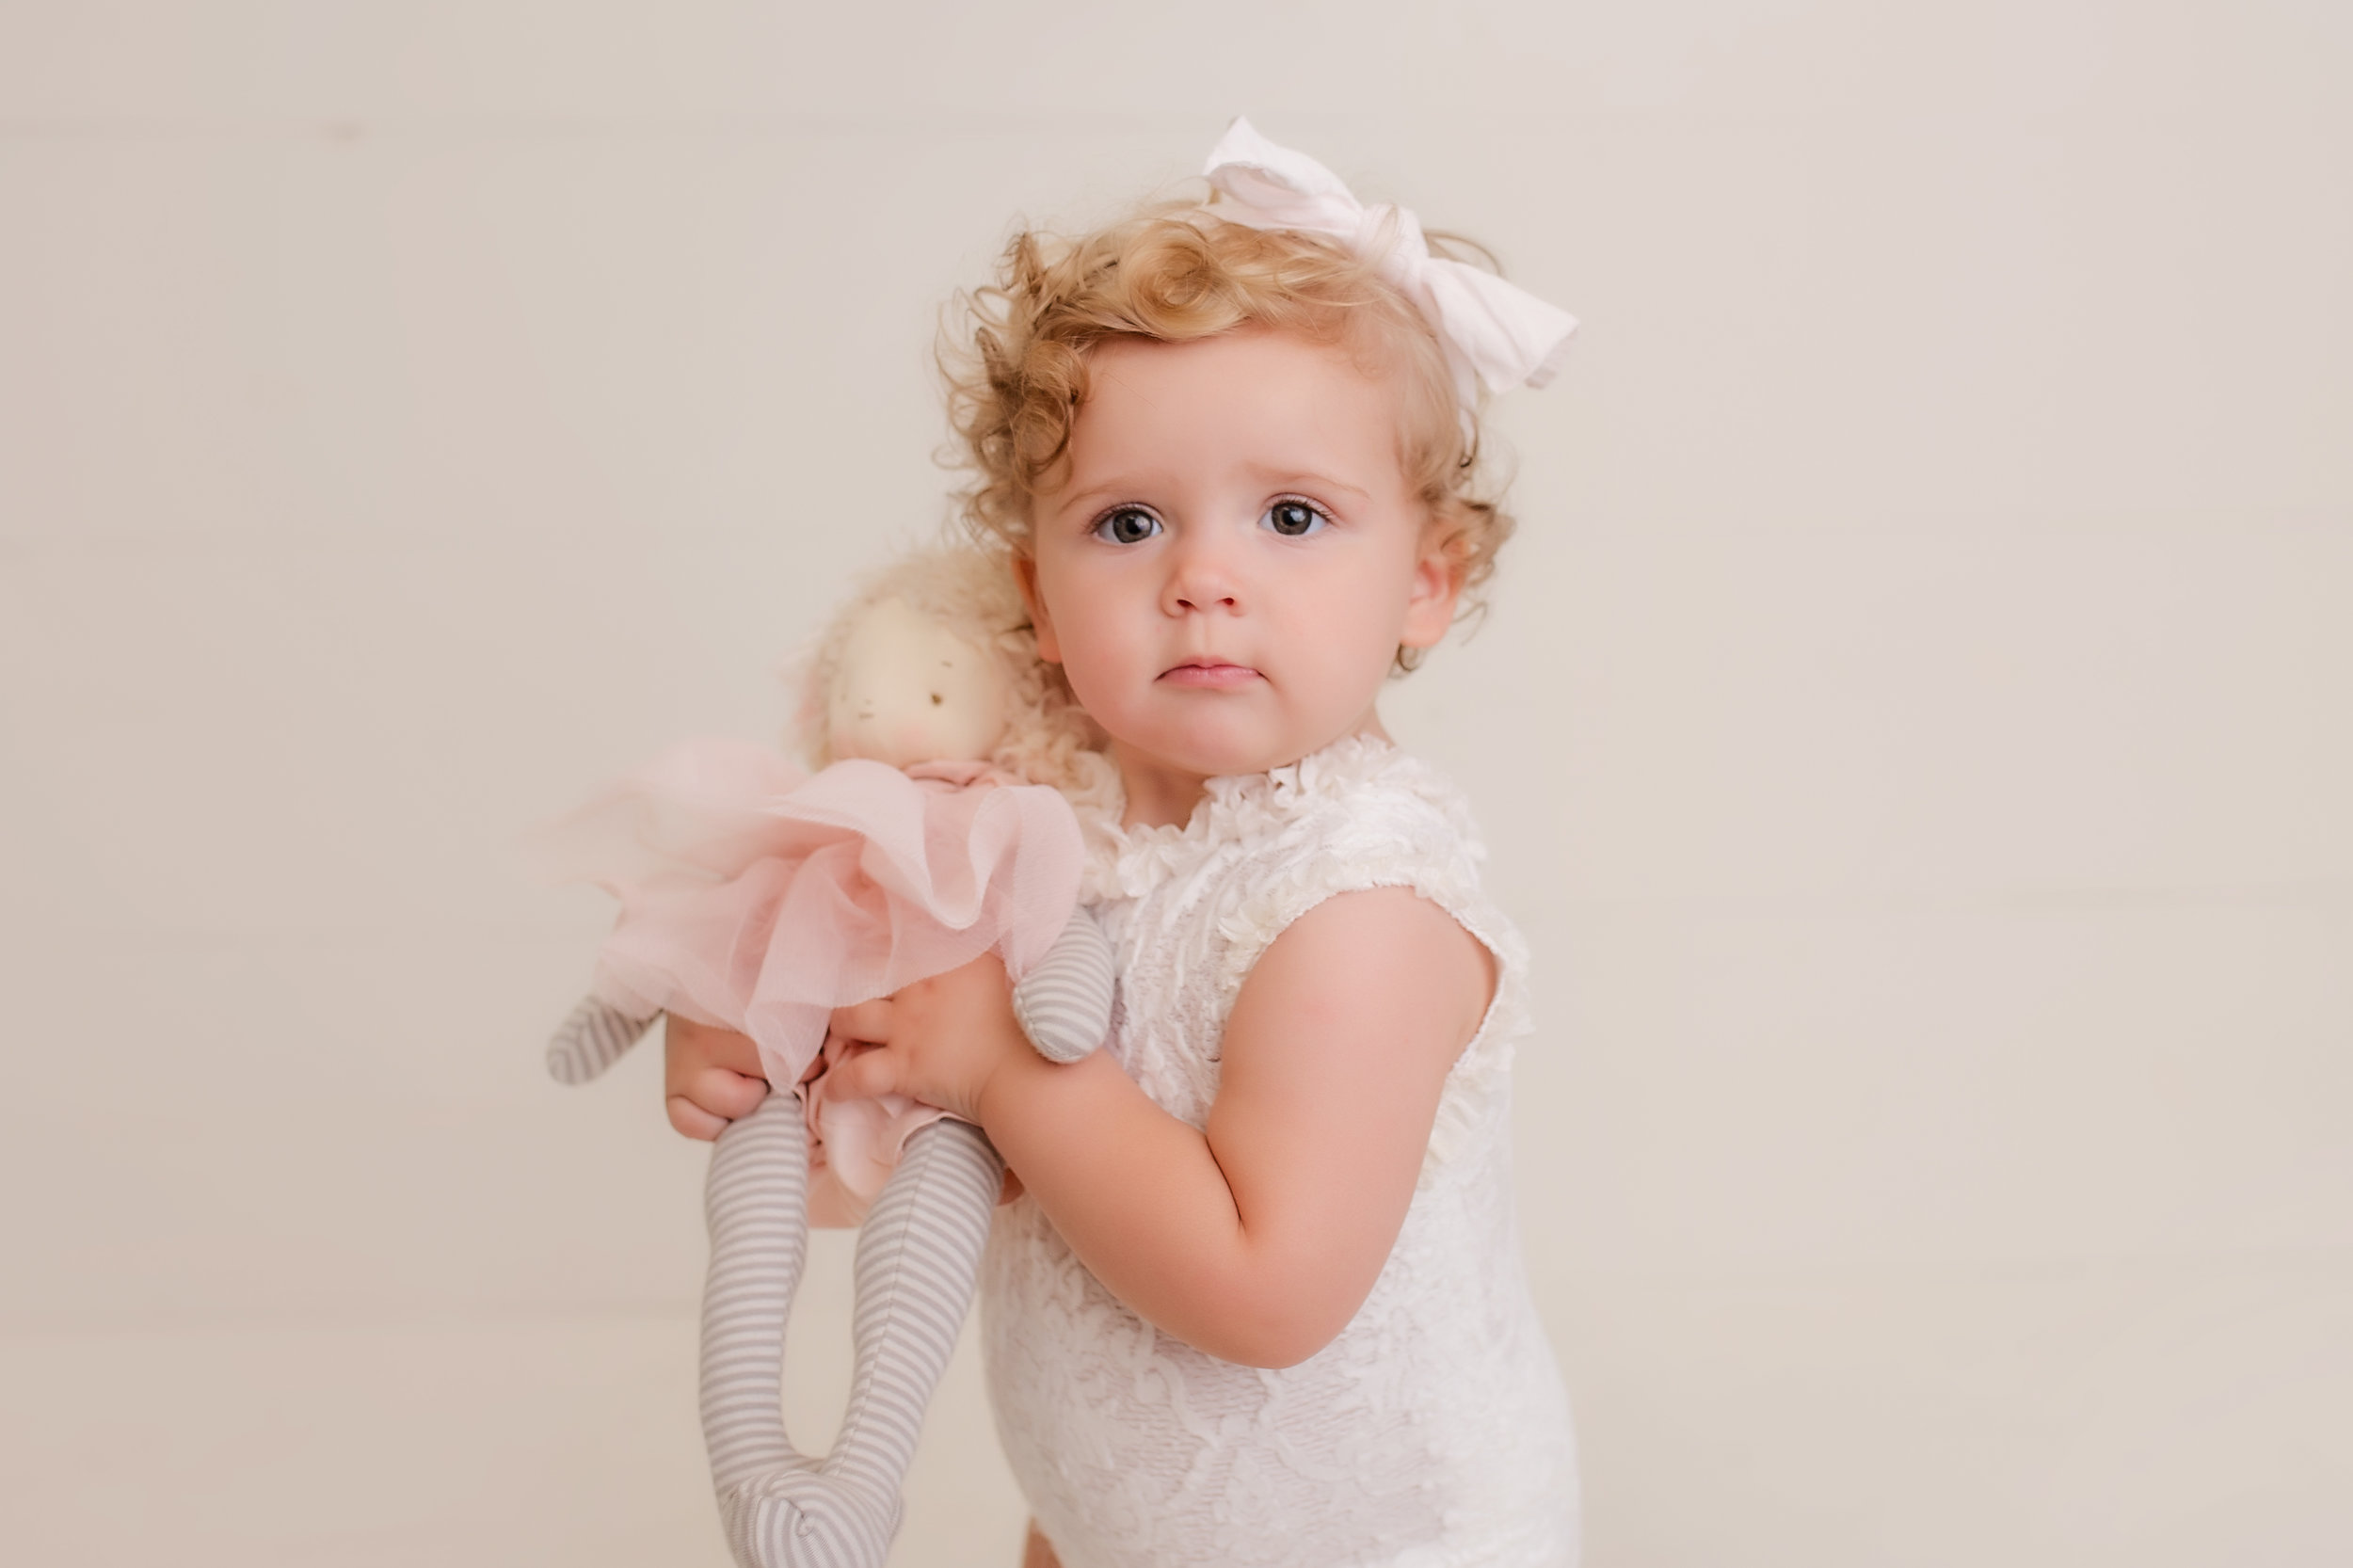 Studio Portrait minis - perfect for milestones and families